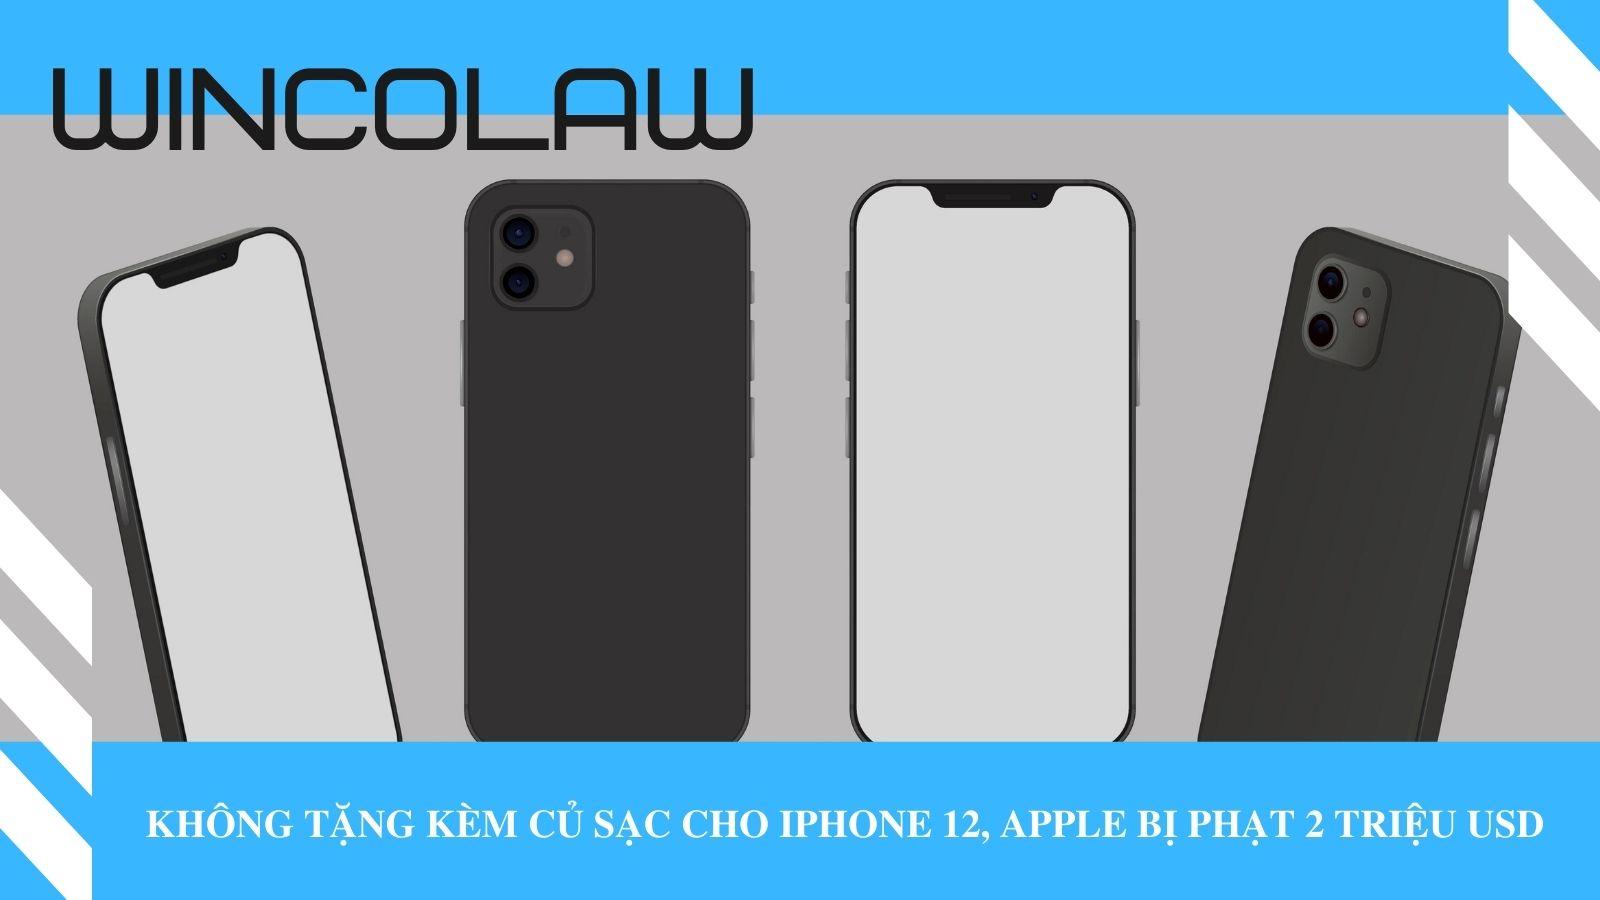 Không tặng kèm củ sạc cho iPhone 12, Apple bị phạt 2 triệu USD